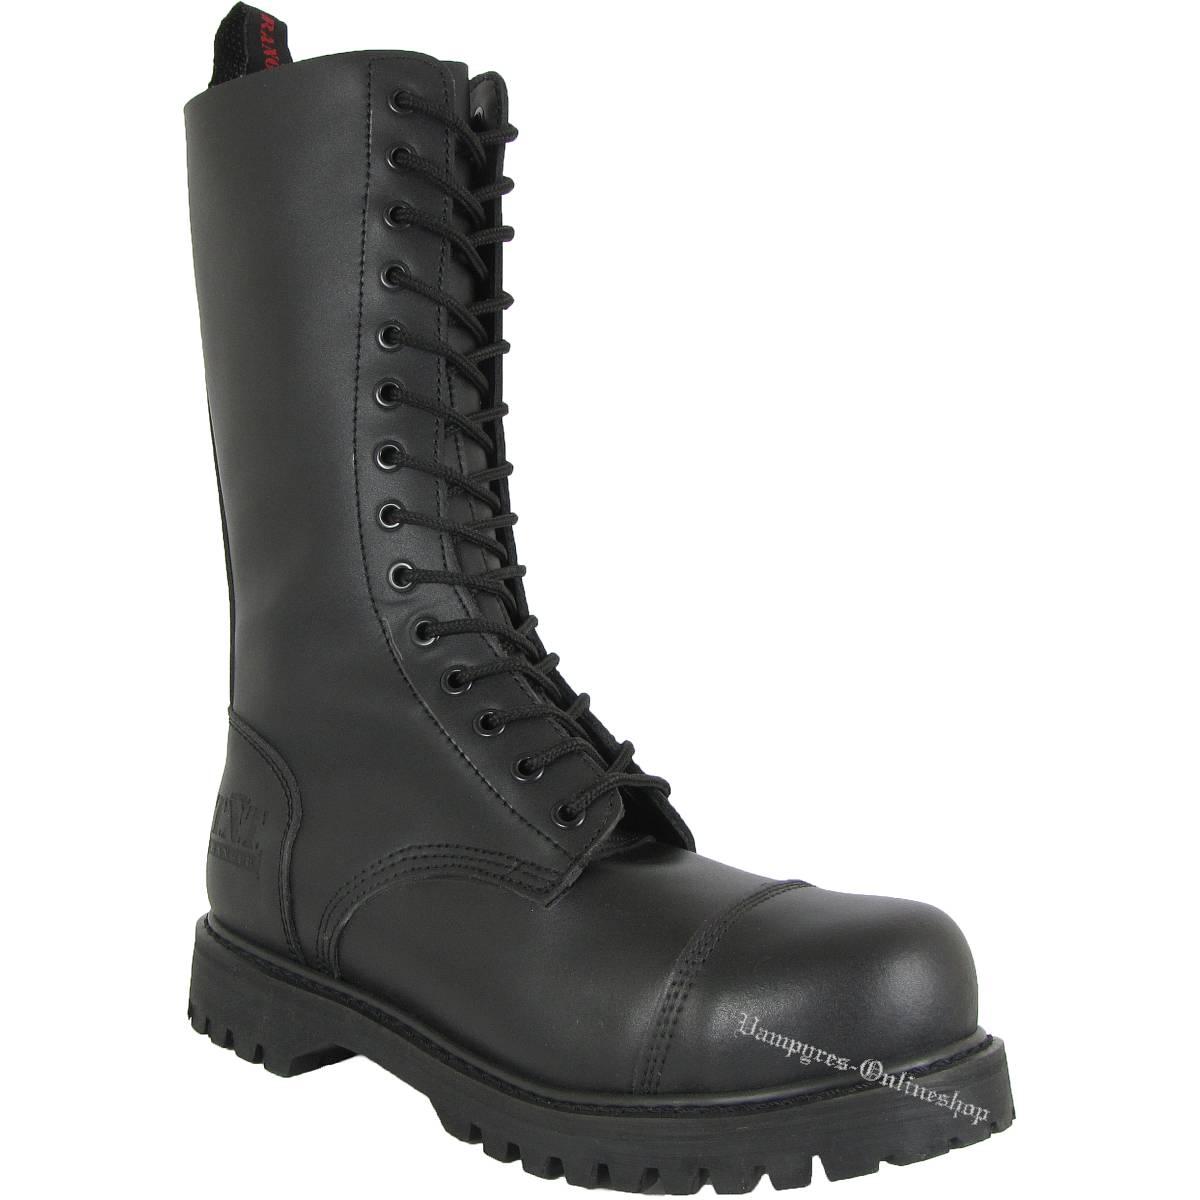 TNT 14-Loch Side-Zip Stiefel Schwarz Rangers Boots